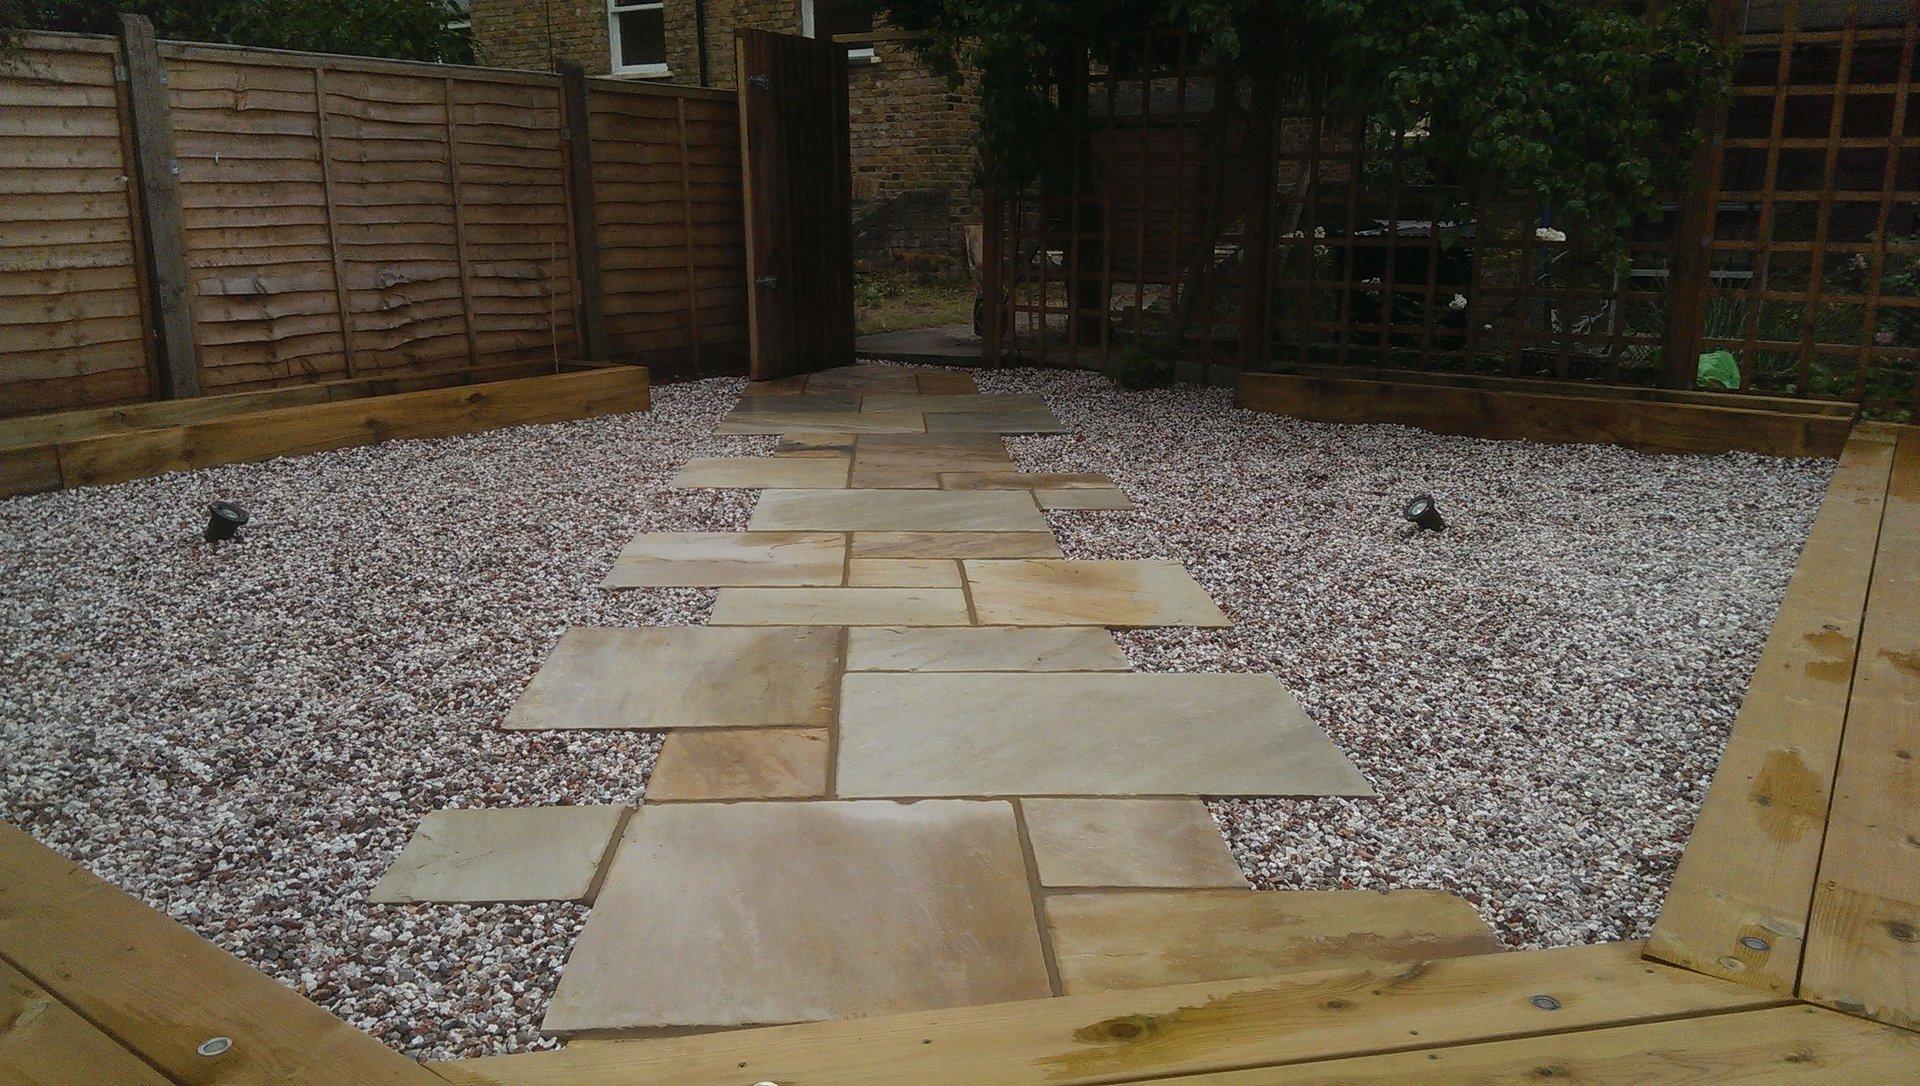 London Garden Builders design Fossil Mint paving. Garden in Hackney